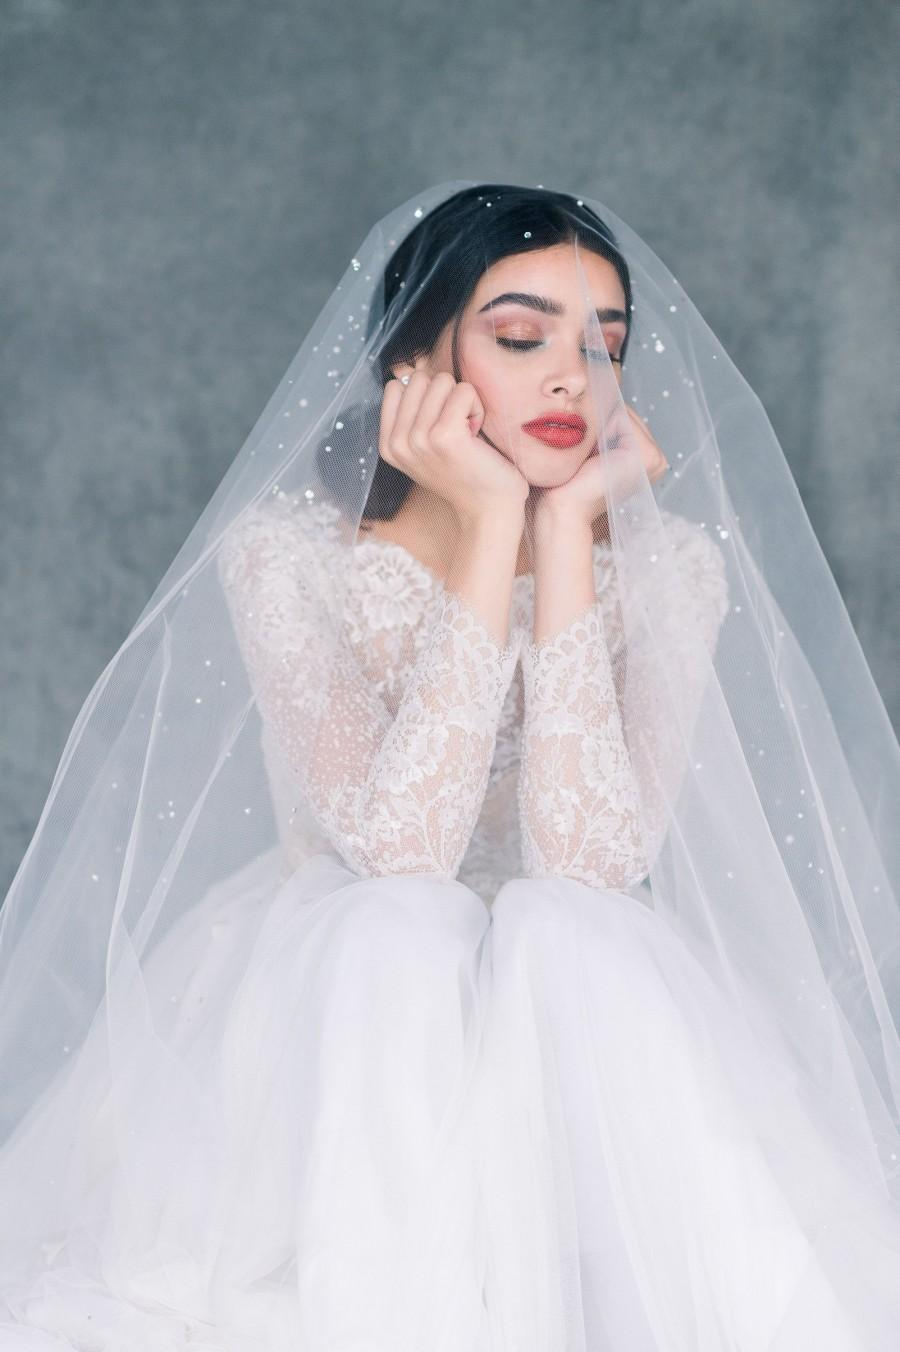 Wedding - Scattered Crystal Drop Veil, Pearl Blusher Veil, Statement Bridal Veil, Ivory Wedding Veil, Chapel Length Veil, White Cathedral Veil, ASHLYN